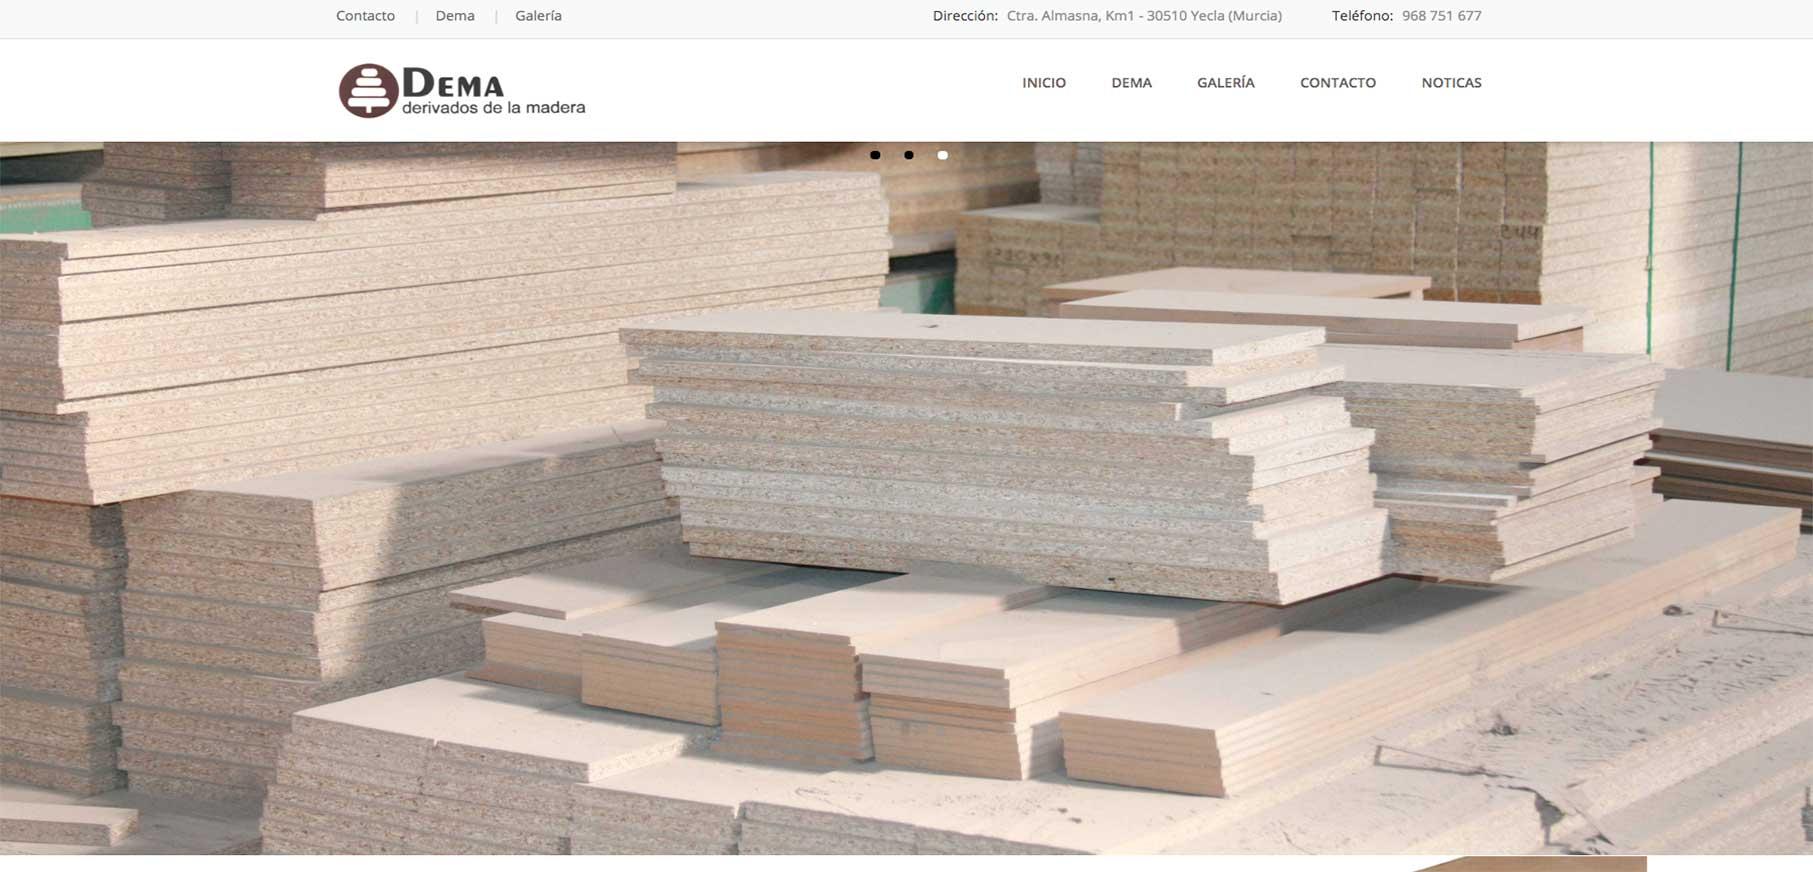 Fabricas muebles yecla ideas de disenos for Fabricas de sofas en yecla